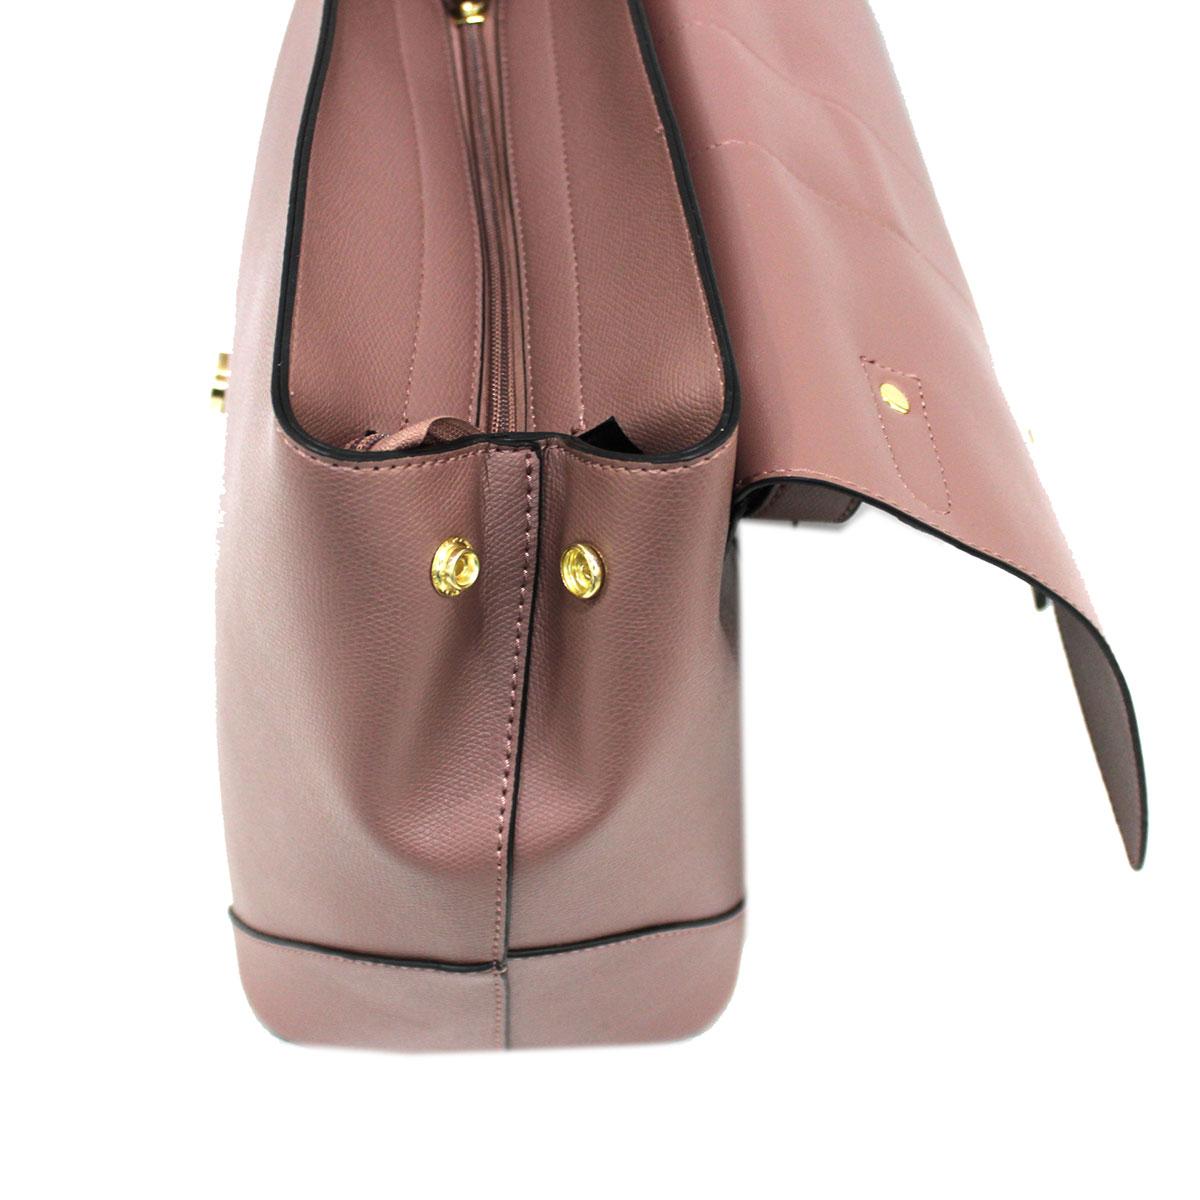 ... Borsa donna in SIMILPELLE shopping a mano LANCETTI linea classic 7514  rosa Colore  ... d79ff541abc